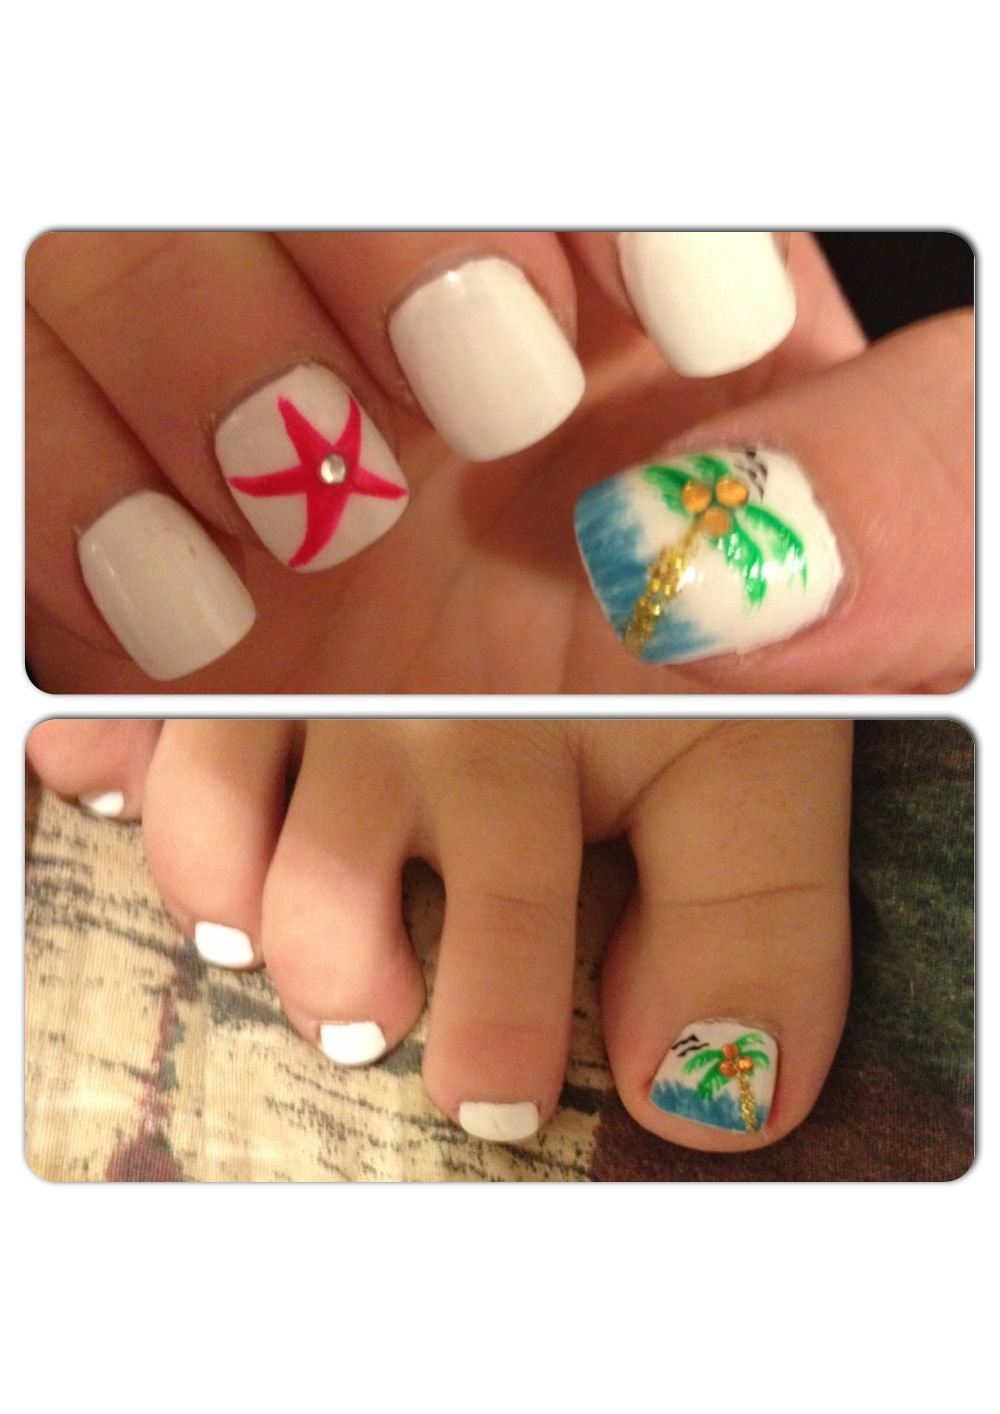 Beach nails, vacation nails #Milwaukee #PolishedNailBar we <3 these ...